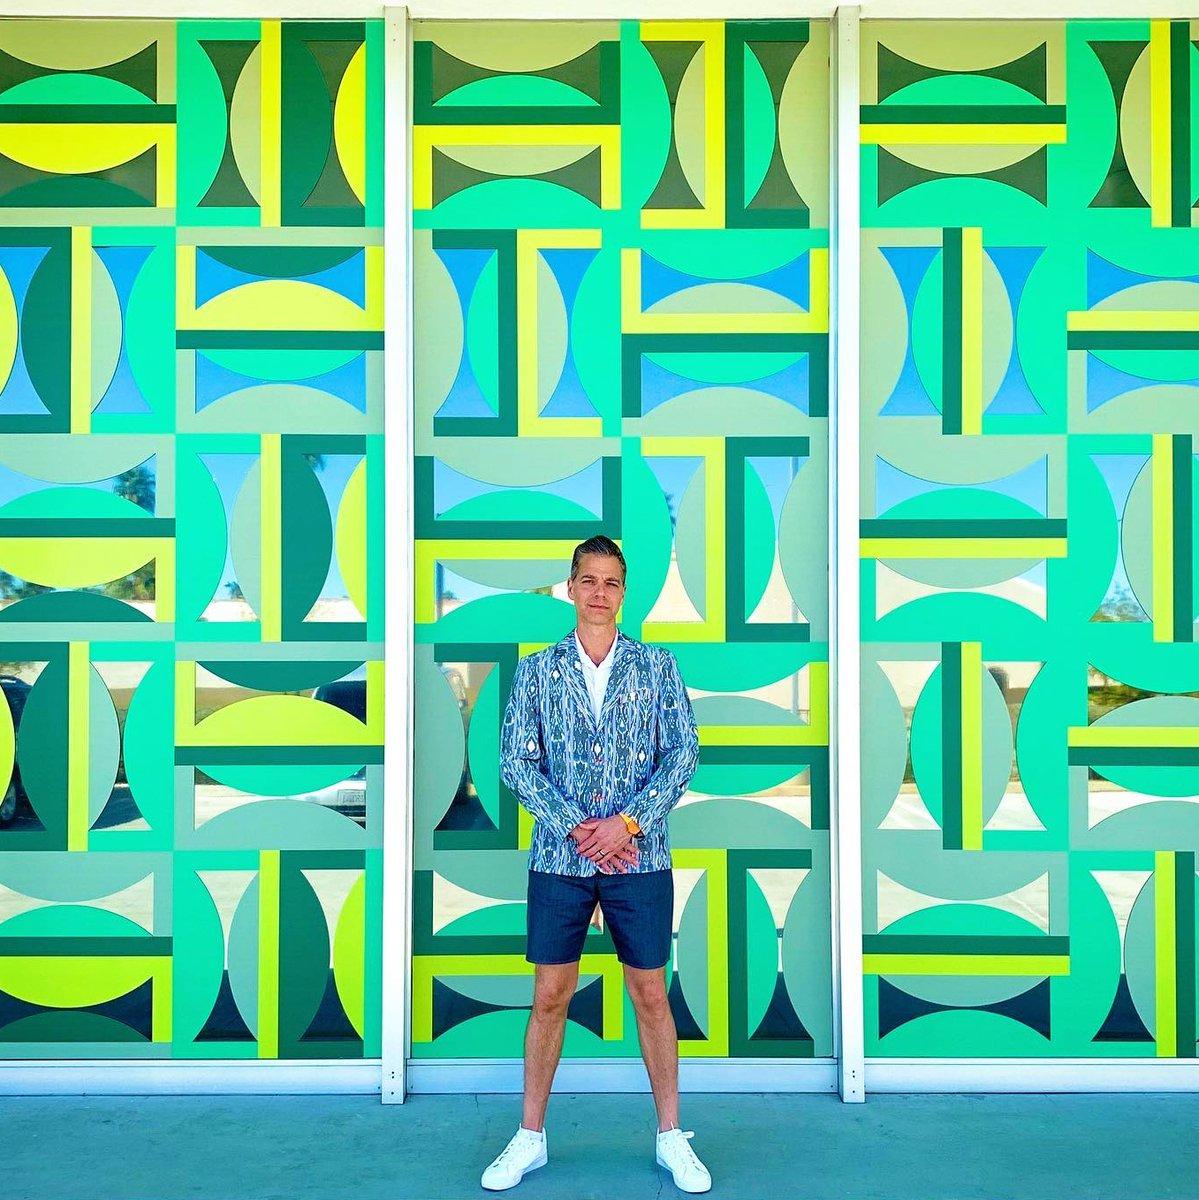 Bright Colors, Bold Patterns 💚@philipheckman @jimisermann #MrTurkStyle #MrTurk #PalmSpringsStyle #MTOptimism